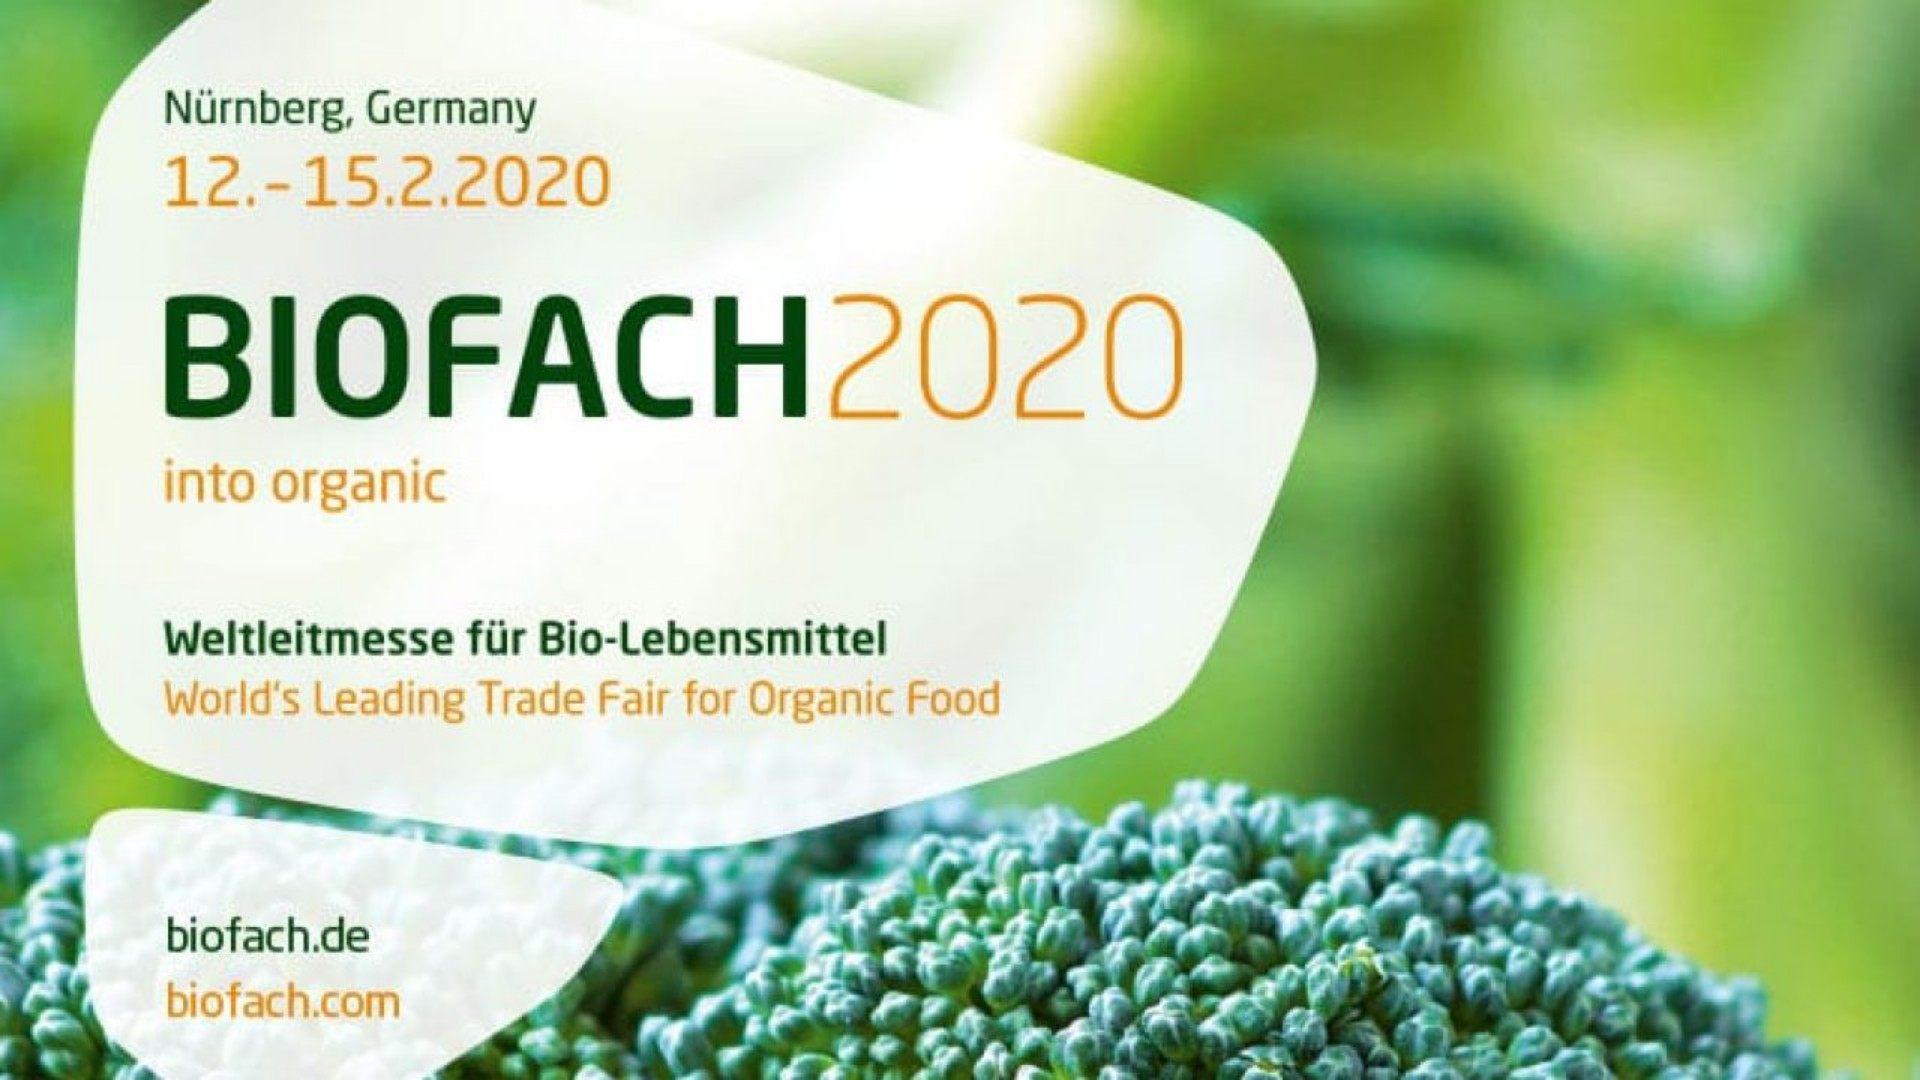 biofach-2020jpg